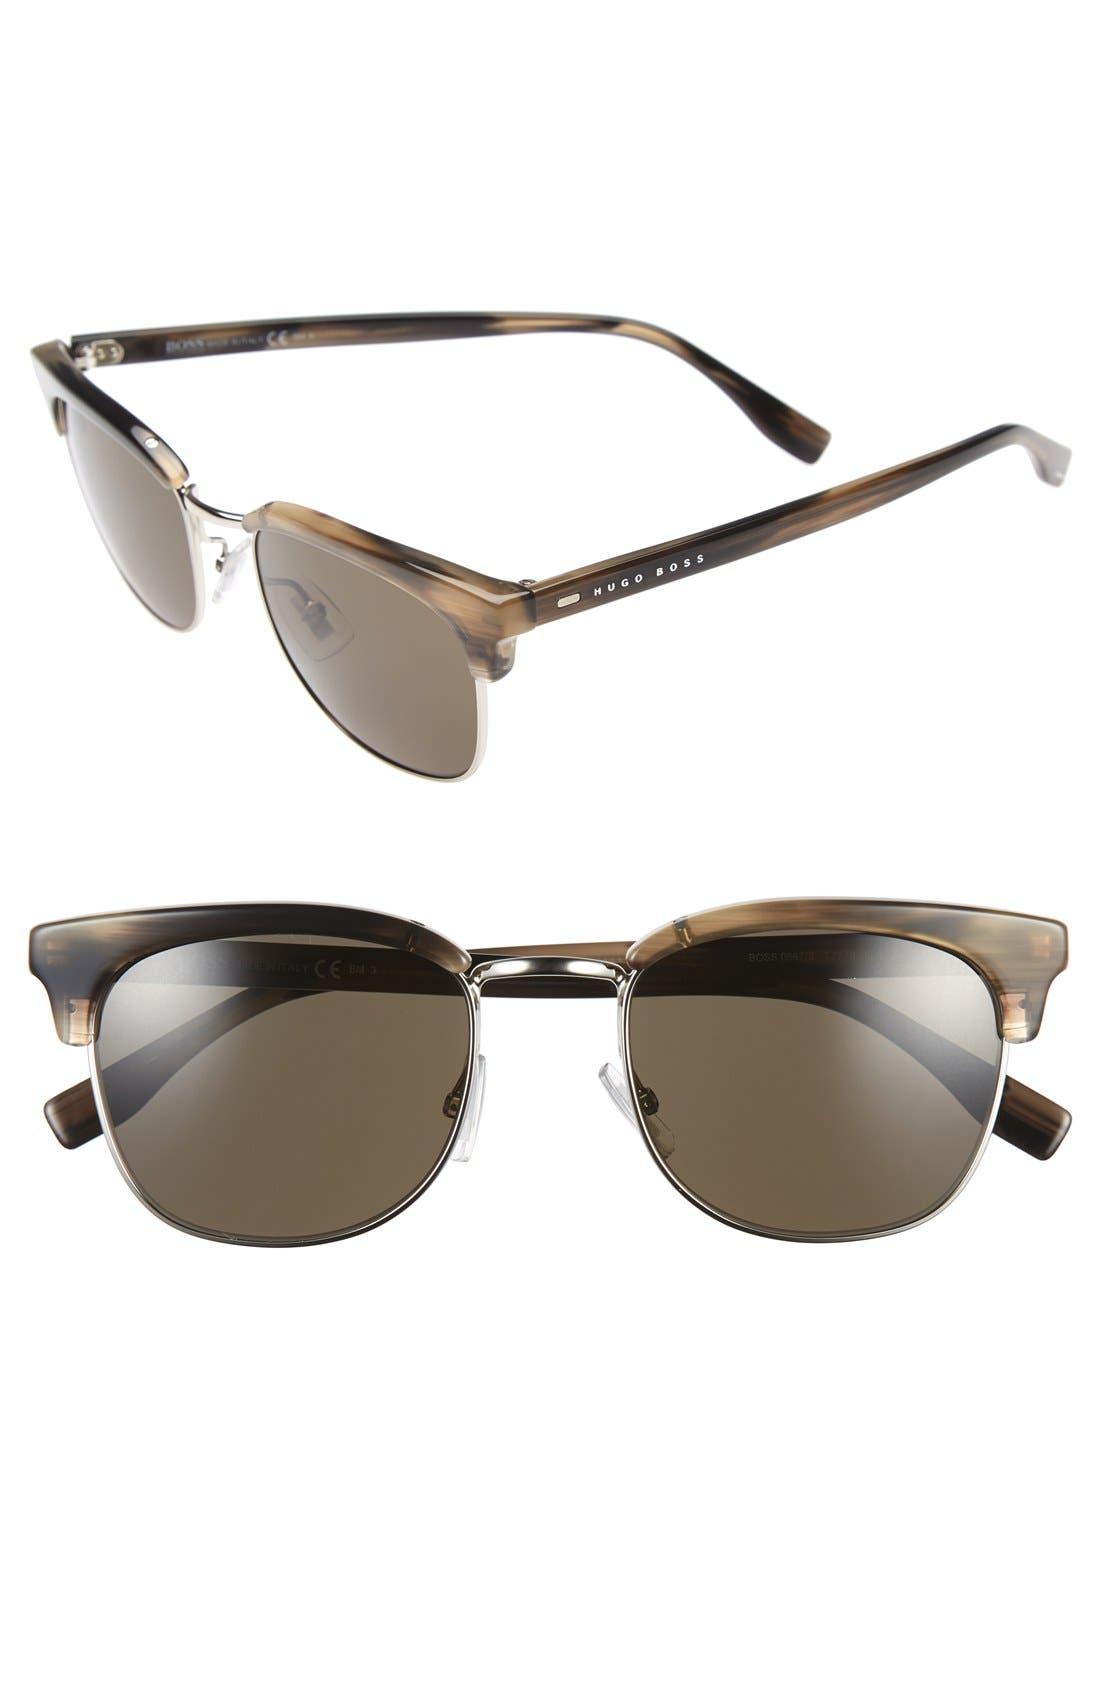 52mm Retro Sunglasses,                         Main,                         color, BROWN HORN/ SILVER/ DARK BROWN